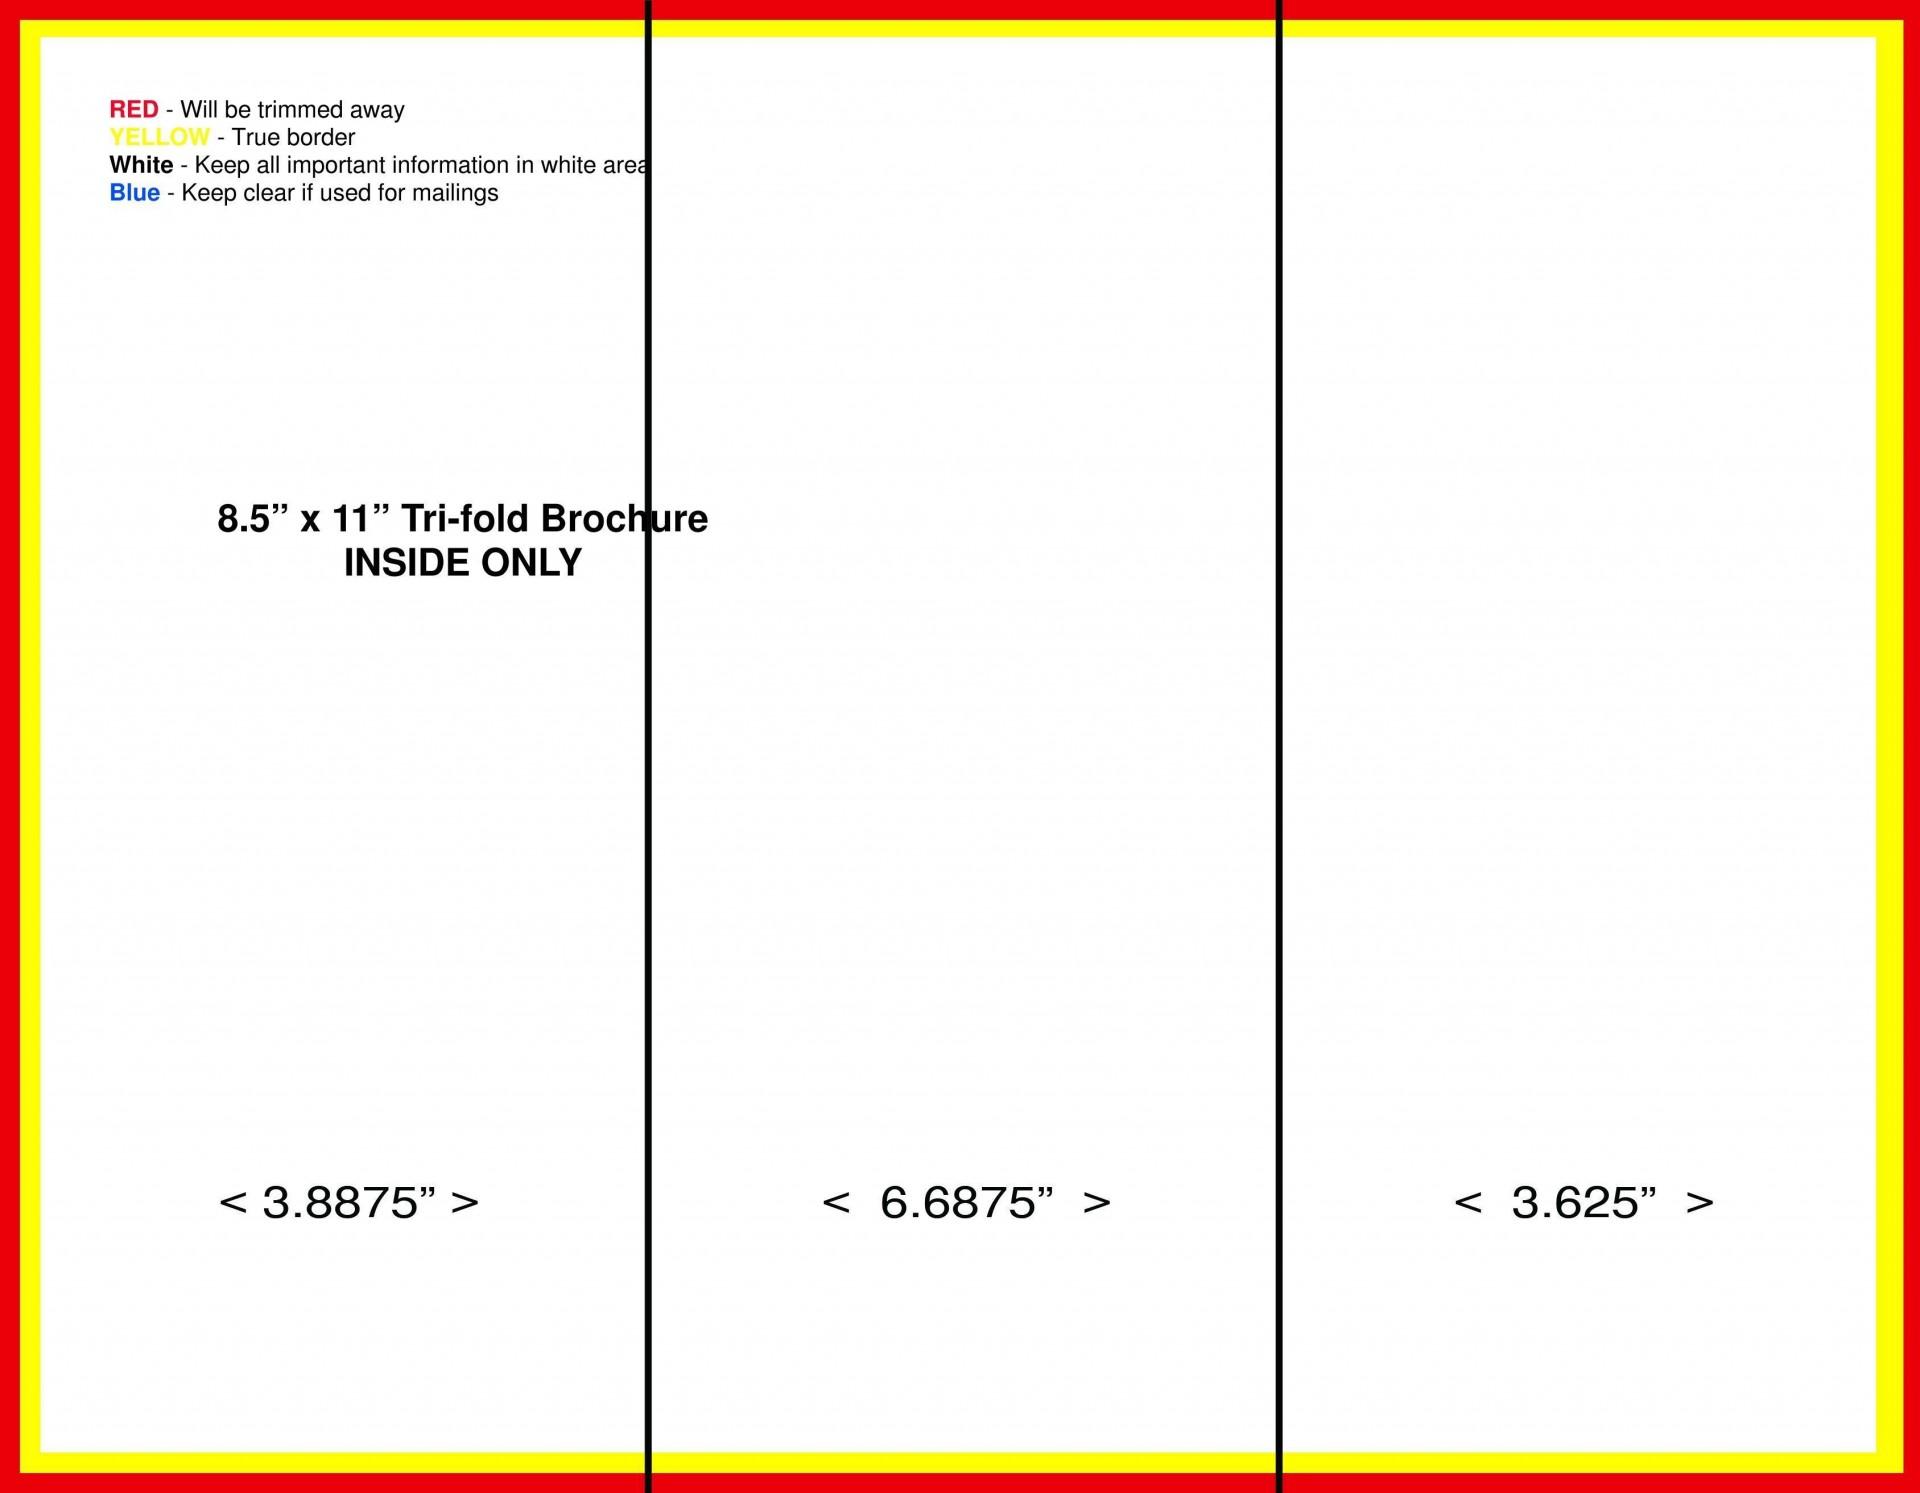 000 Surprising M Word Tri Fold Brochure Template Inspiration  Microsoft Free Download1920